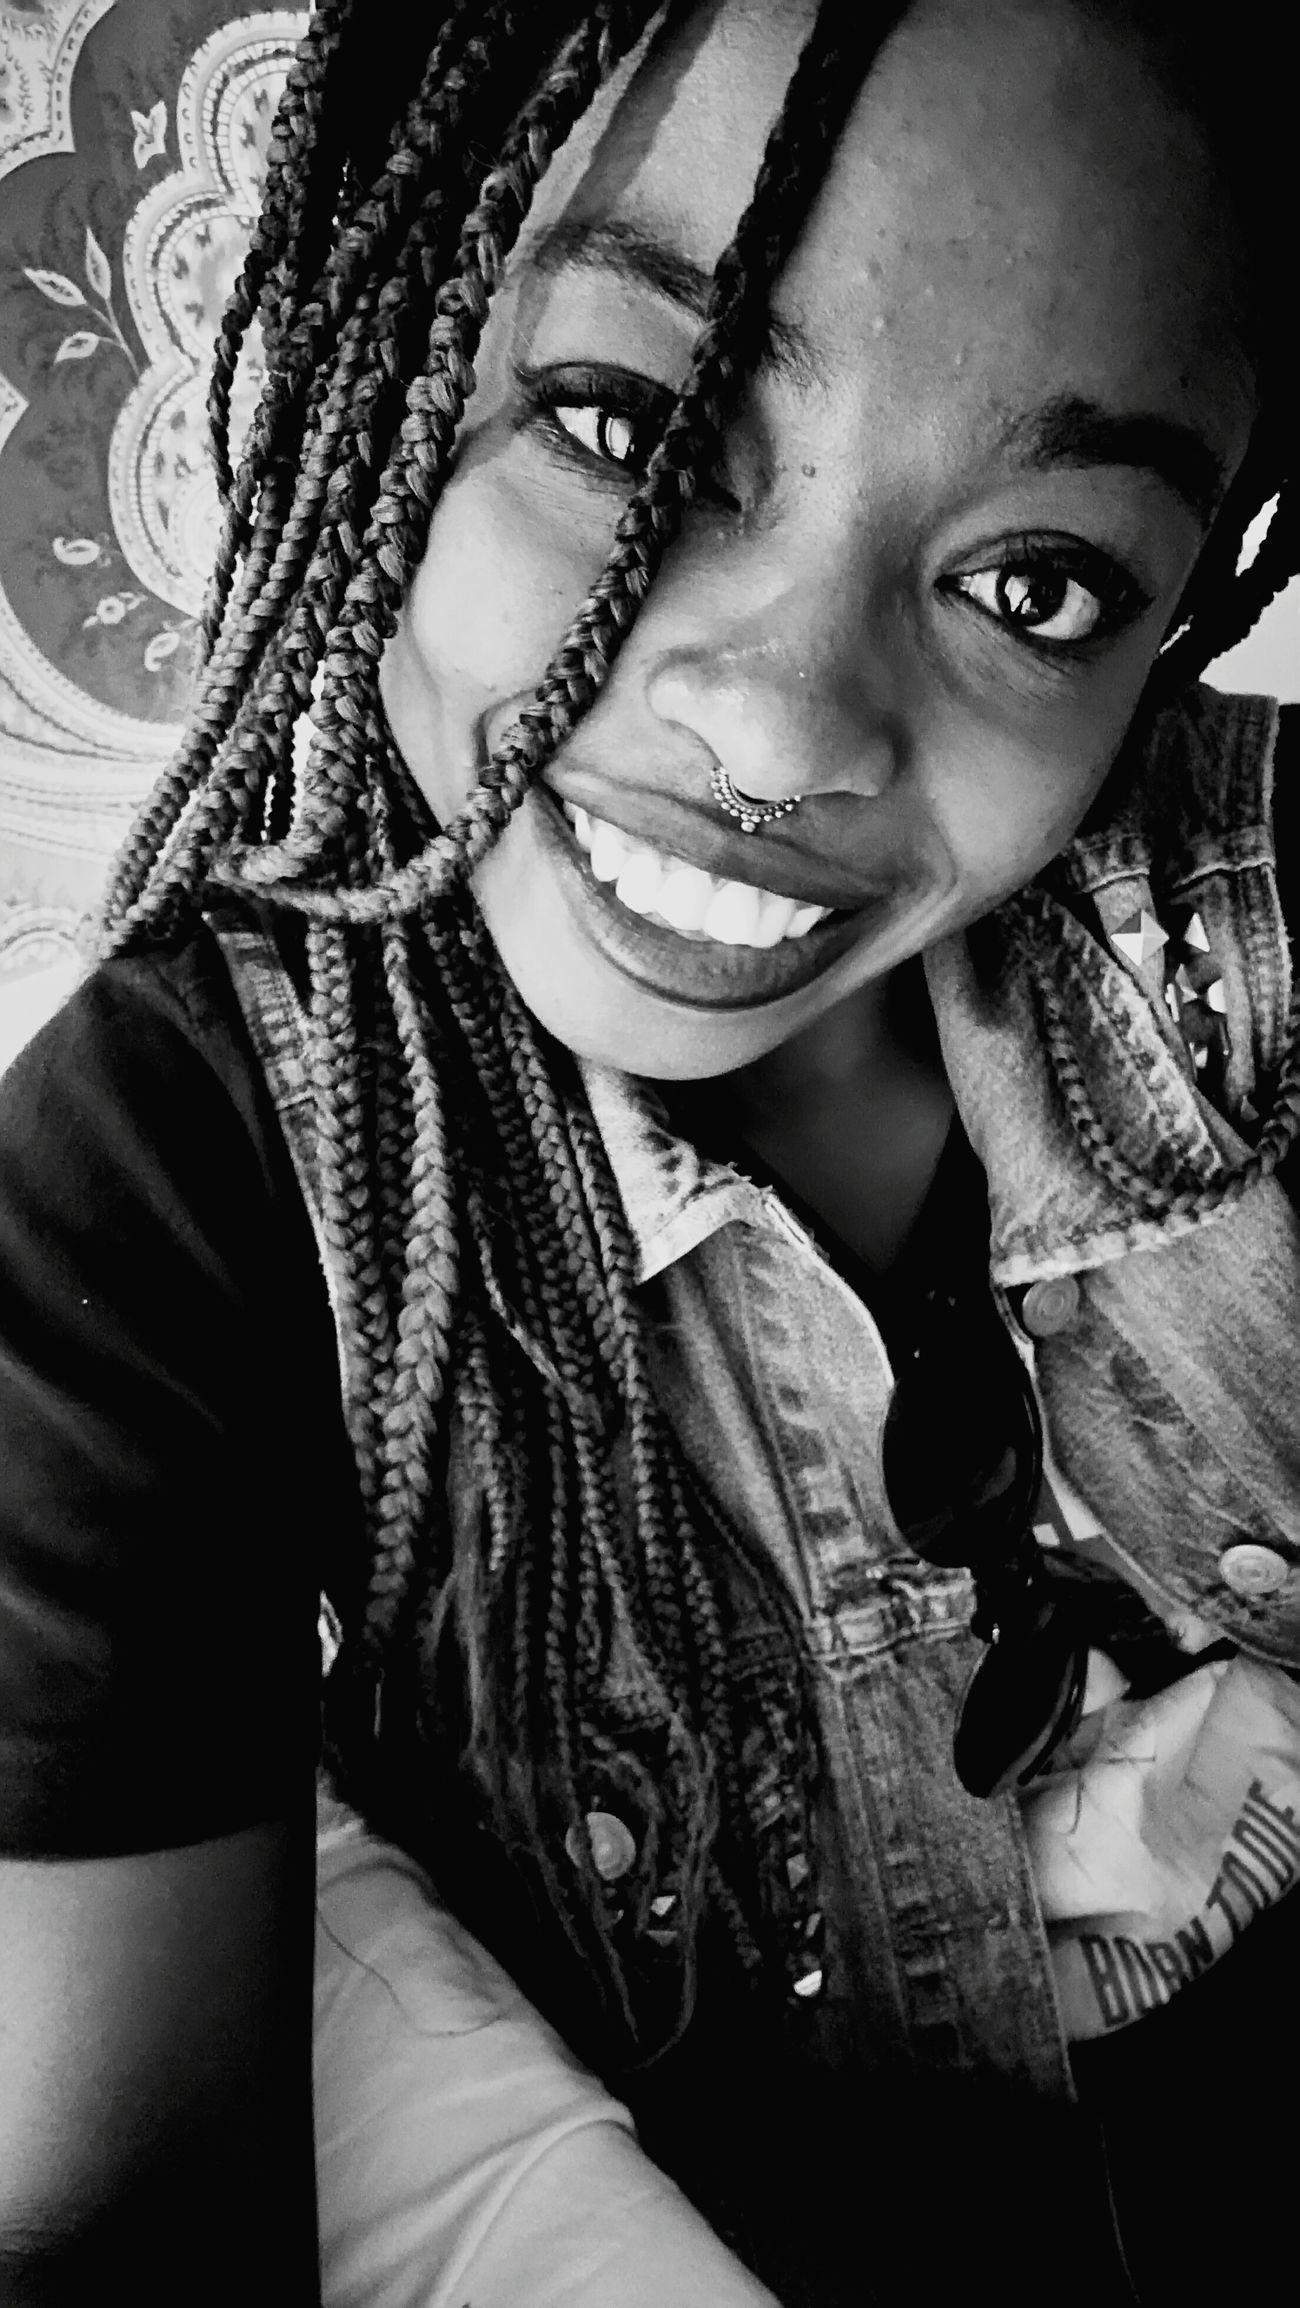 Shutupandsmile Beautiful People Braids <3 Black And White Happy That's Me Behappy:) Goodgirl